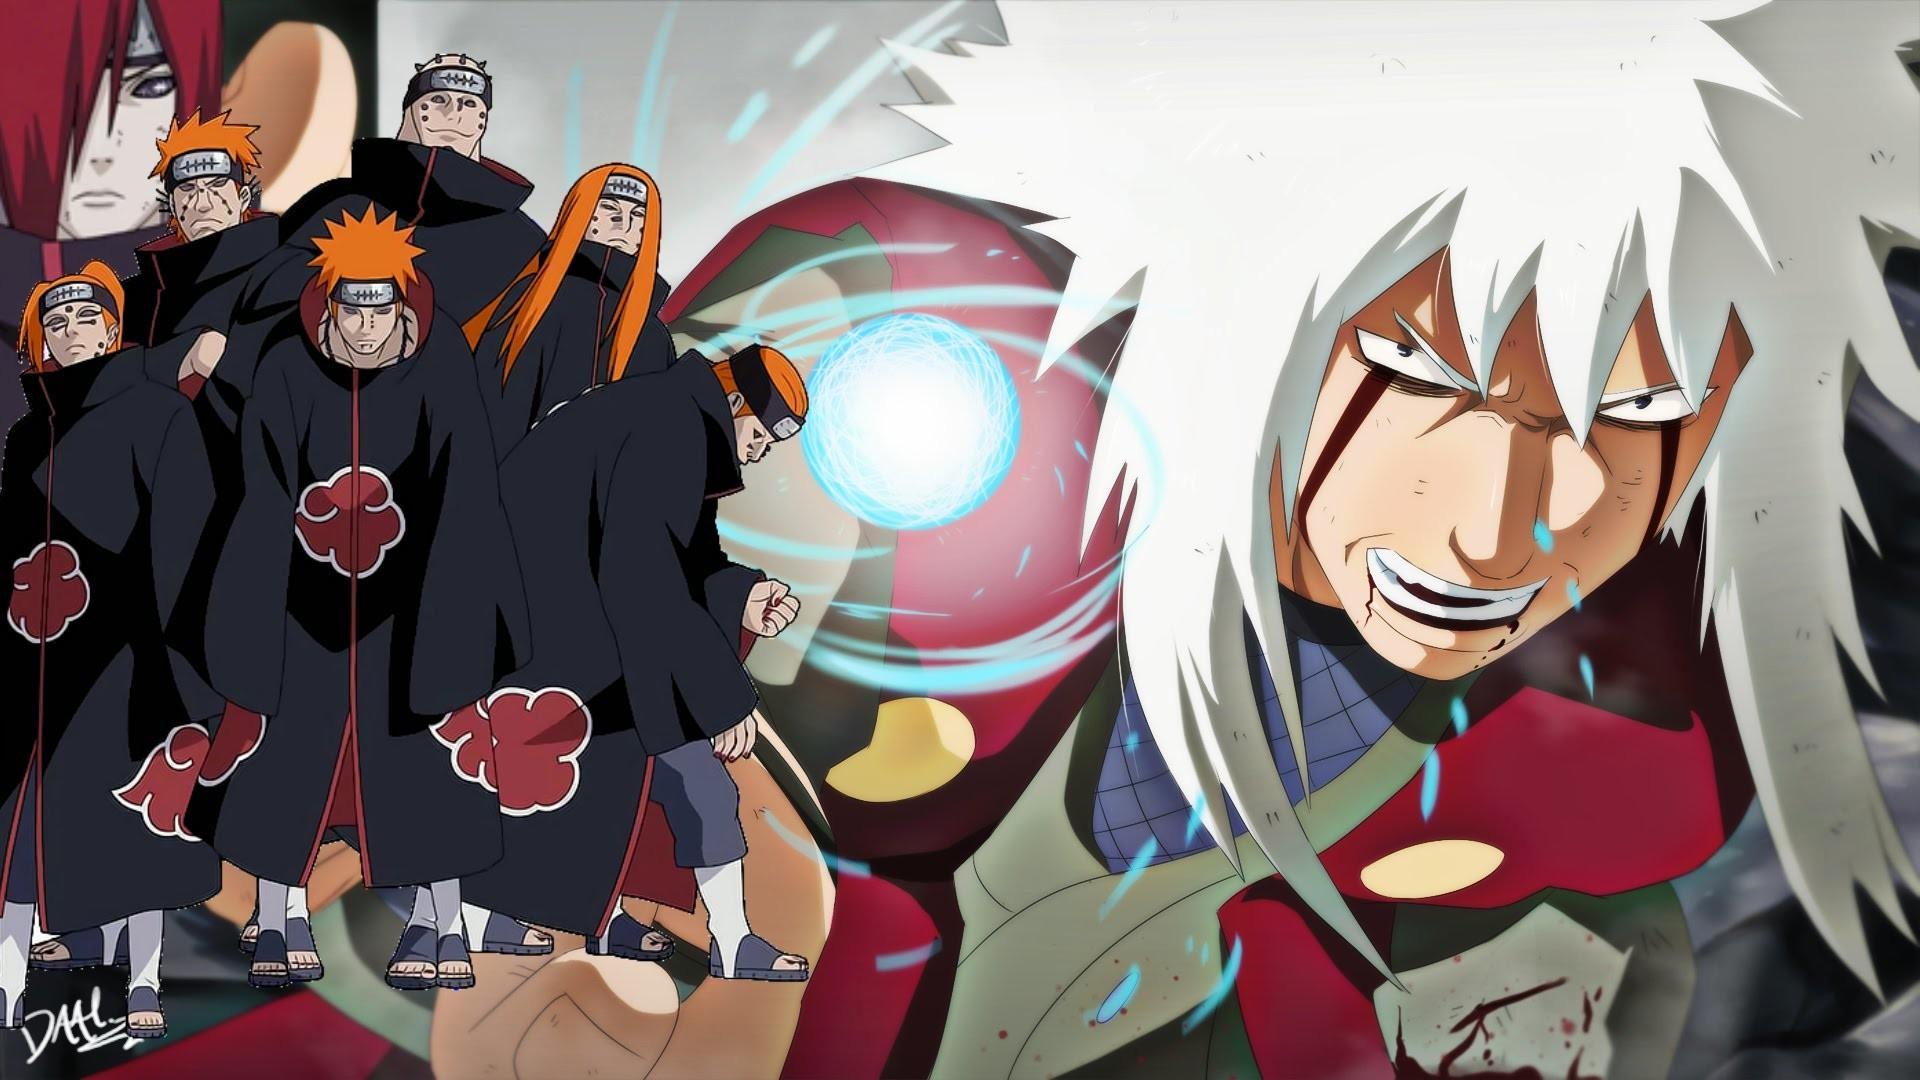 1920x1080 Naruto Shippuuden Hokage Anime Namikaze Minato Uchiha Sasuke Uzumaki Jiraiya Panels Wallpapers HD Desktop And Mobile Backgrounds